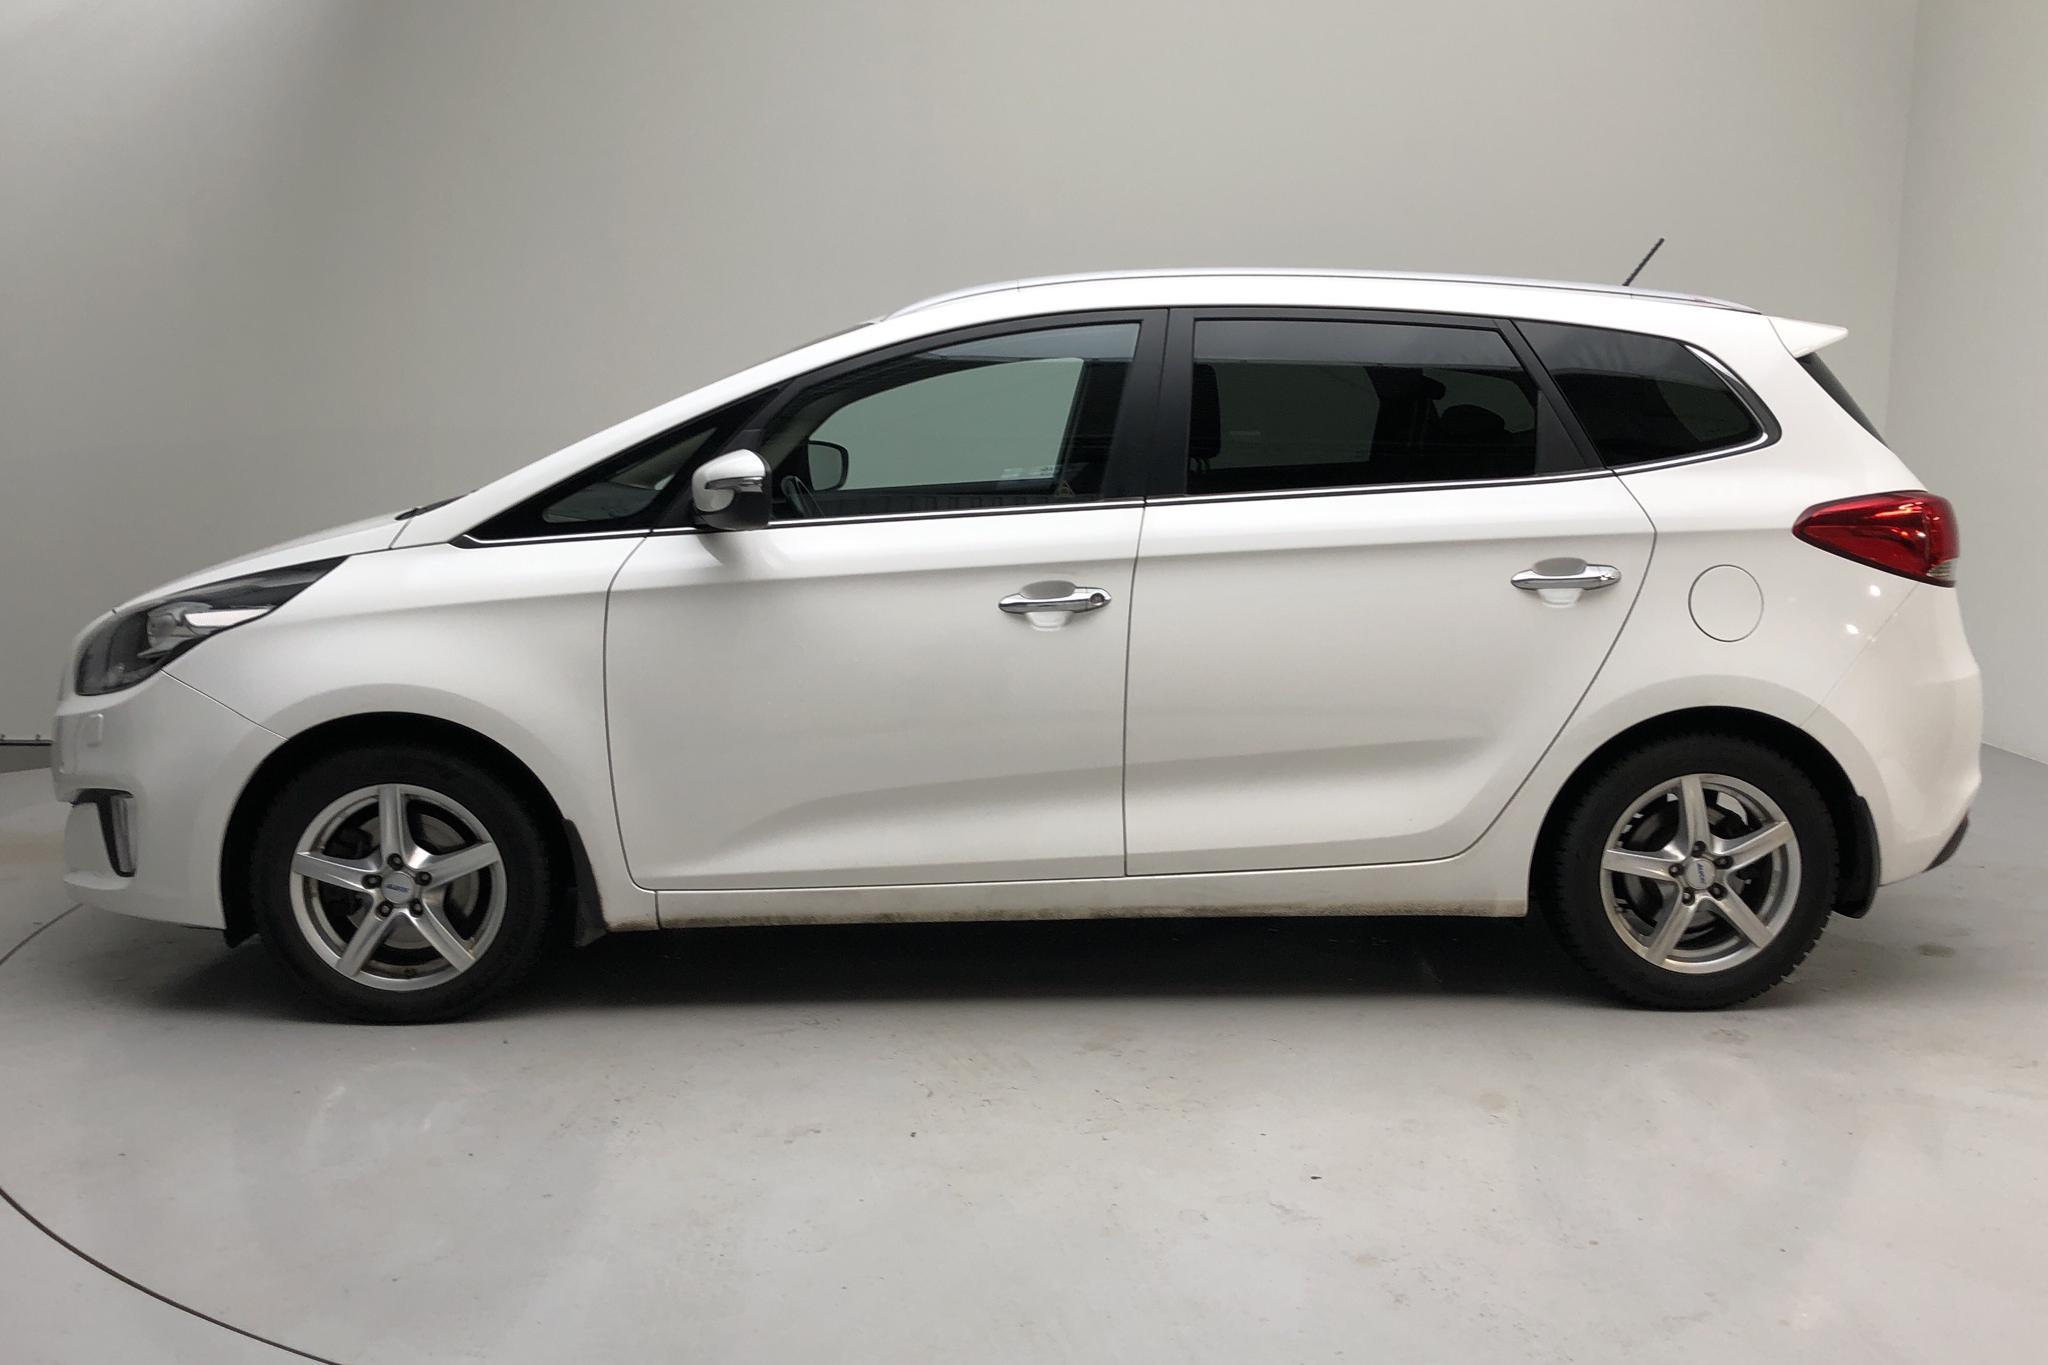 KIA Carens 1.7 CRDi (115hk) - 109 590 km - Manual - white - 2015